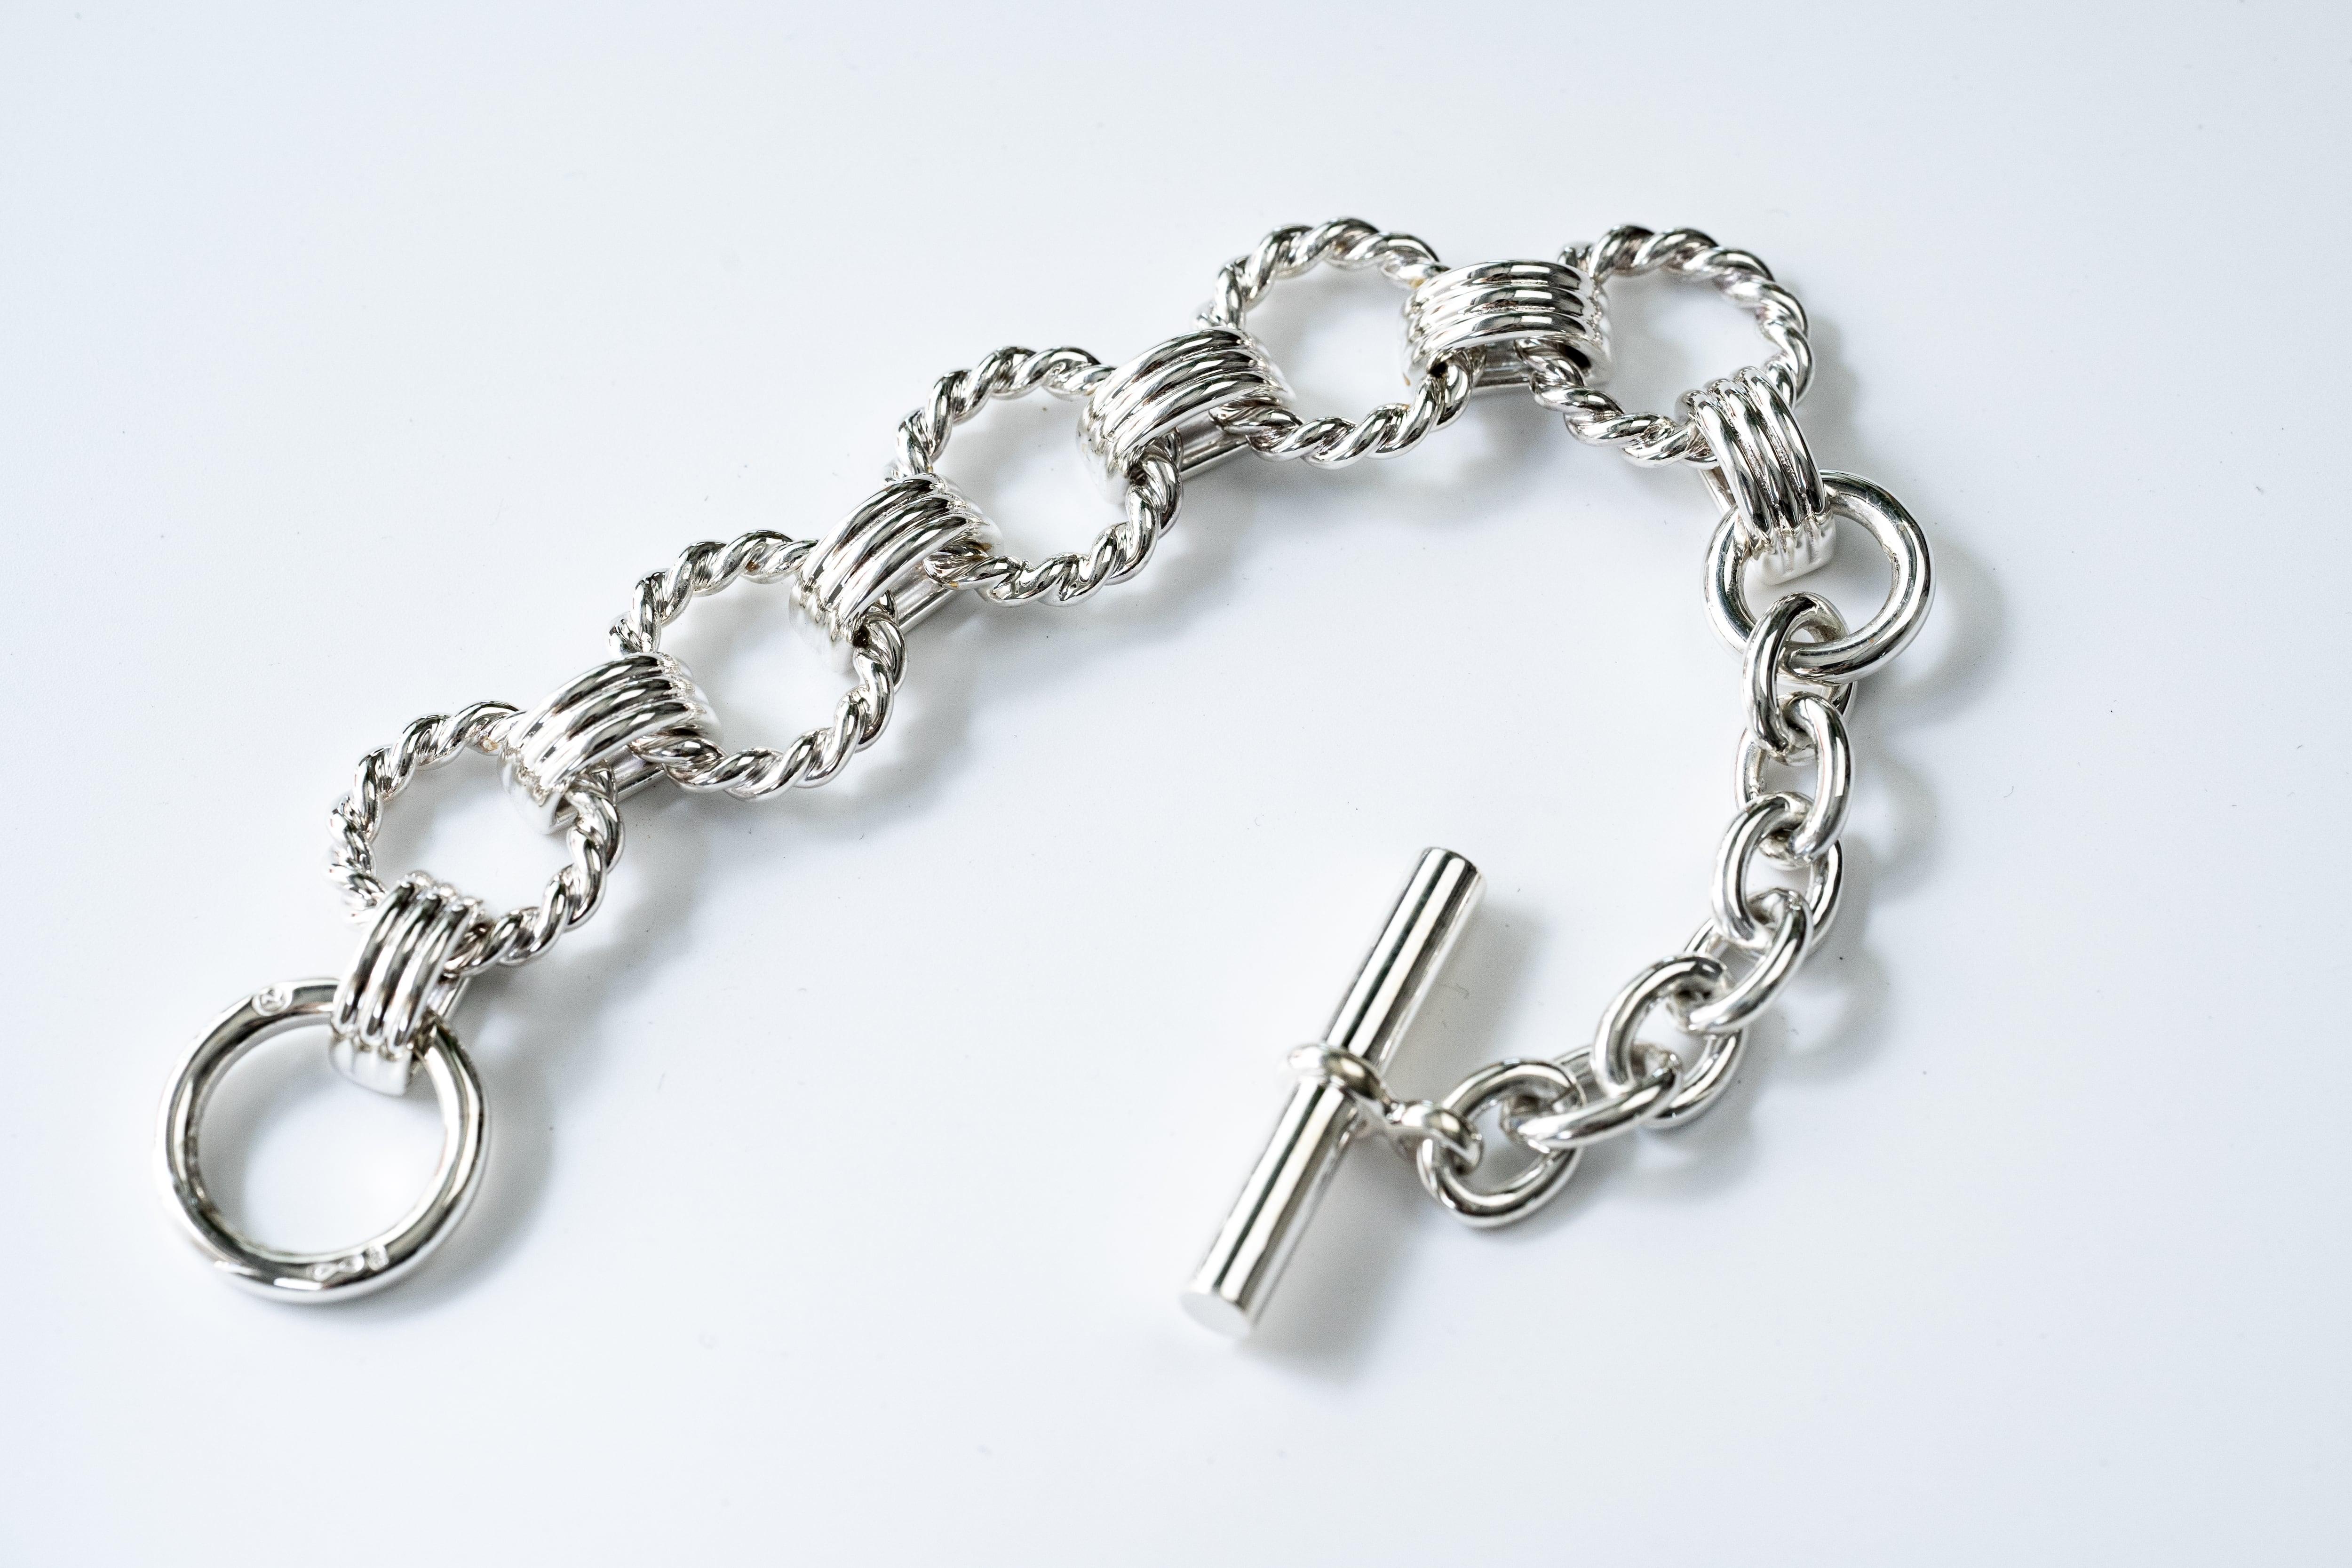 BN-050 All round rope bracelet